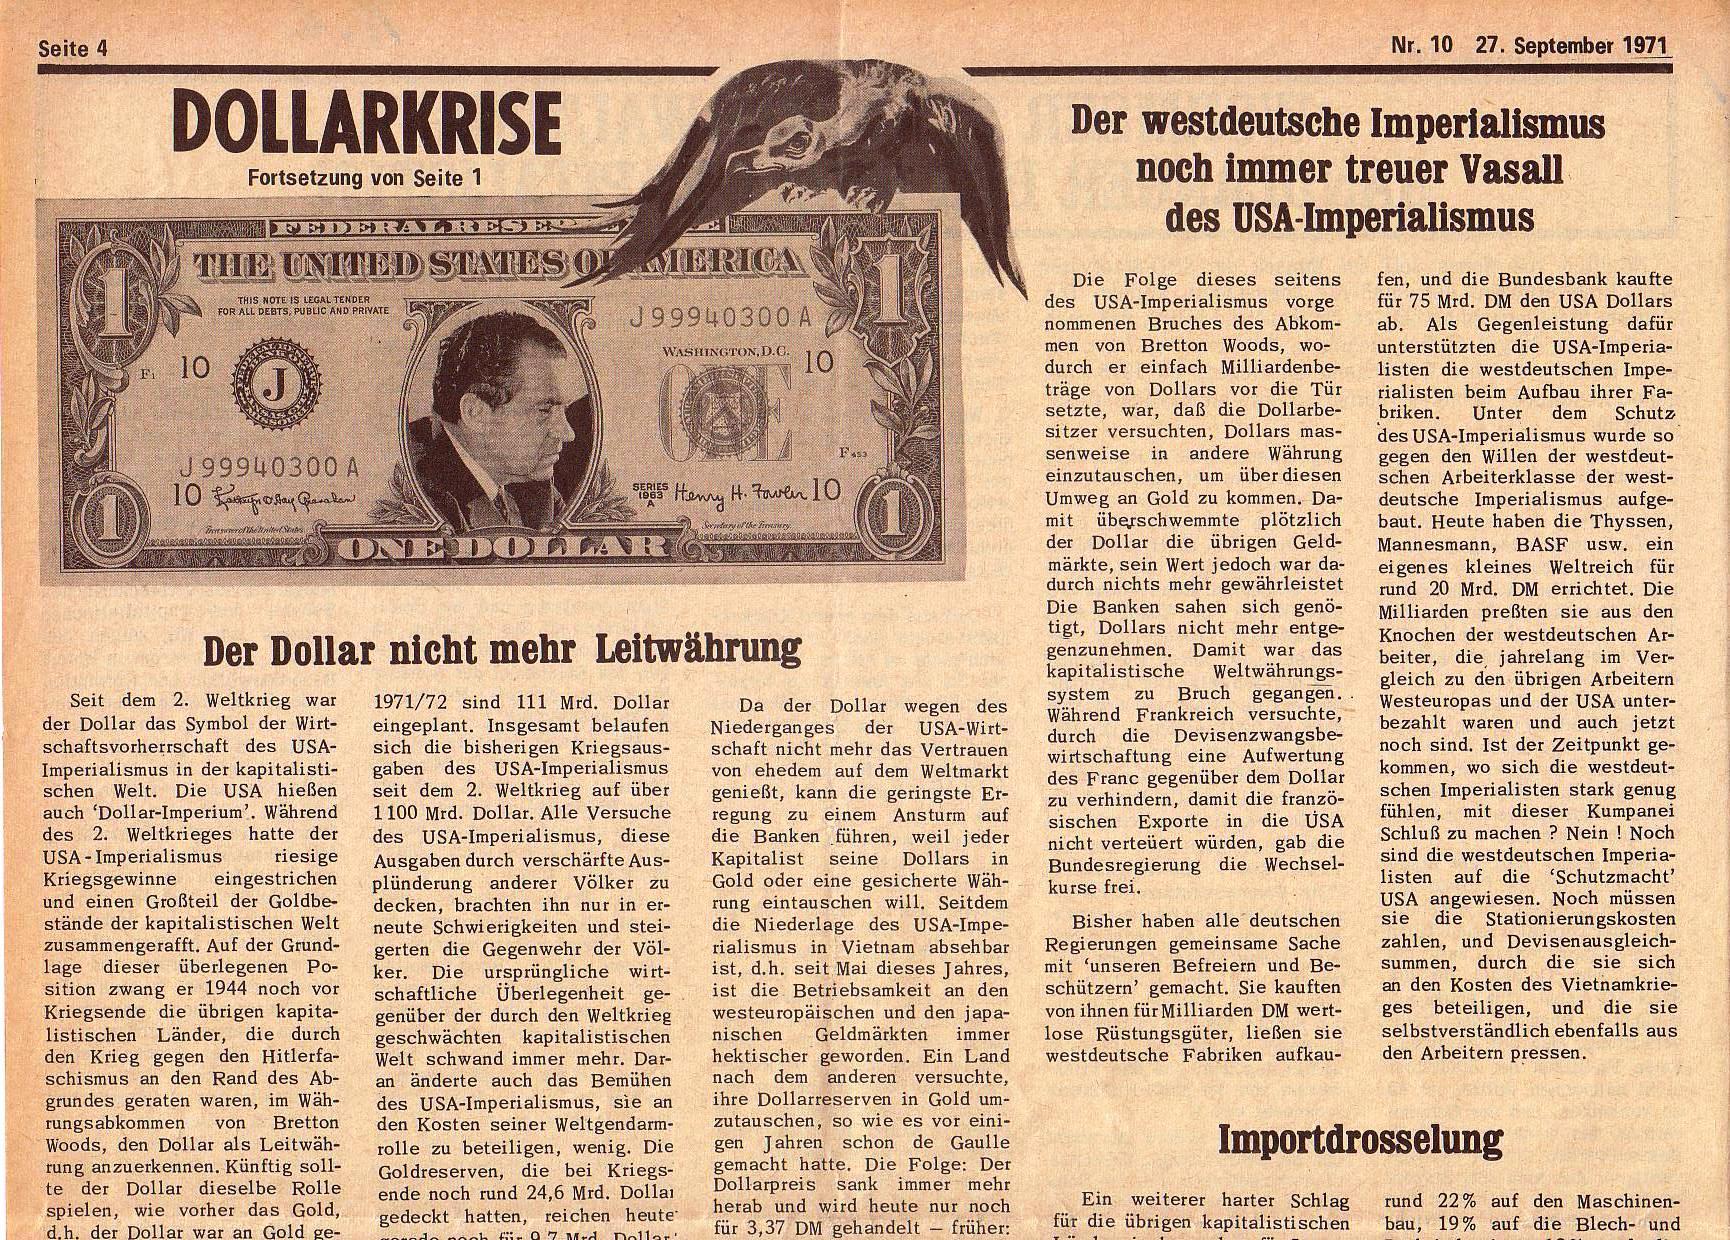 Roter Morgen, 5. Jg., 27. September 1971, Nr. 10, Seite 4a